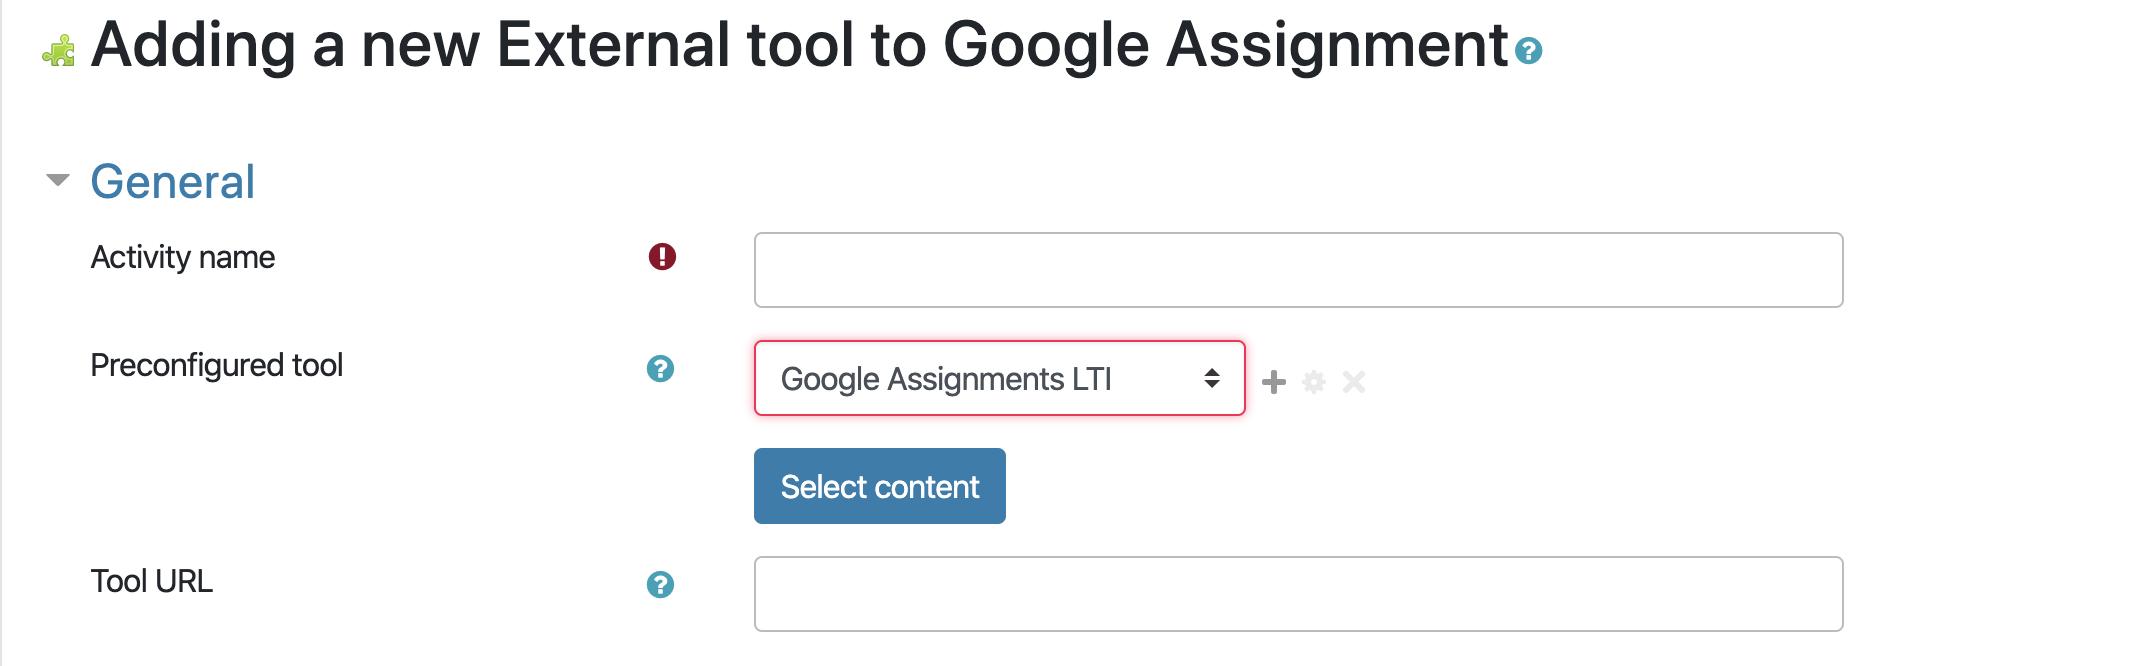 Adding Google Assignment